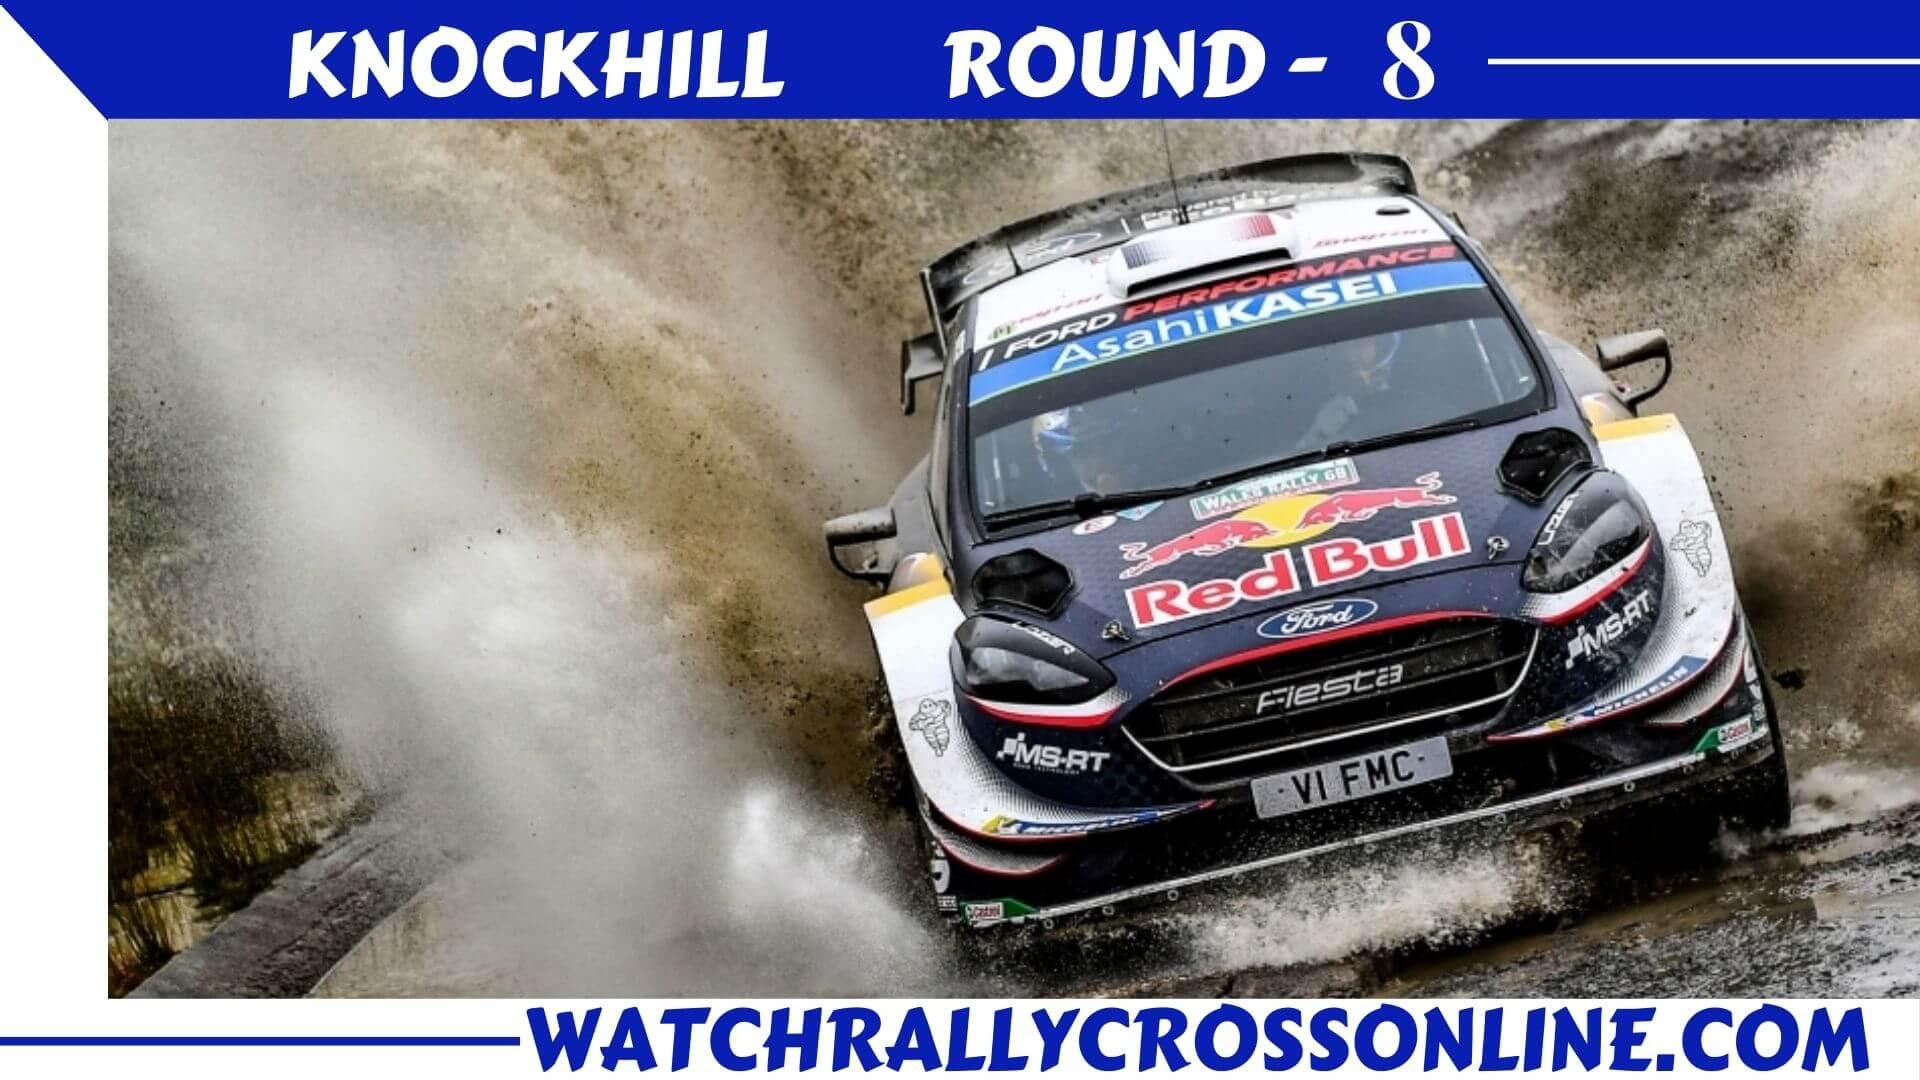 Knockhill BRX 2020 Live Stream | Round 8